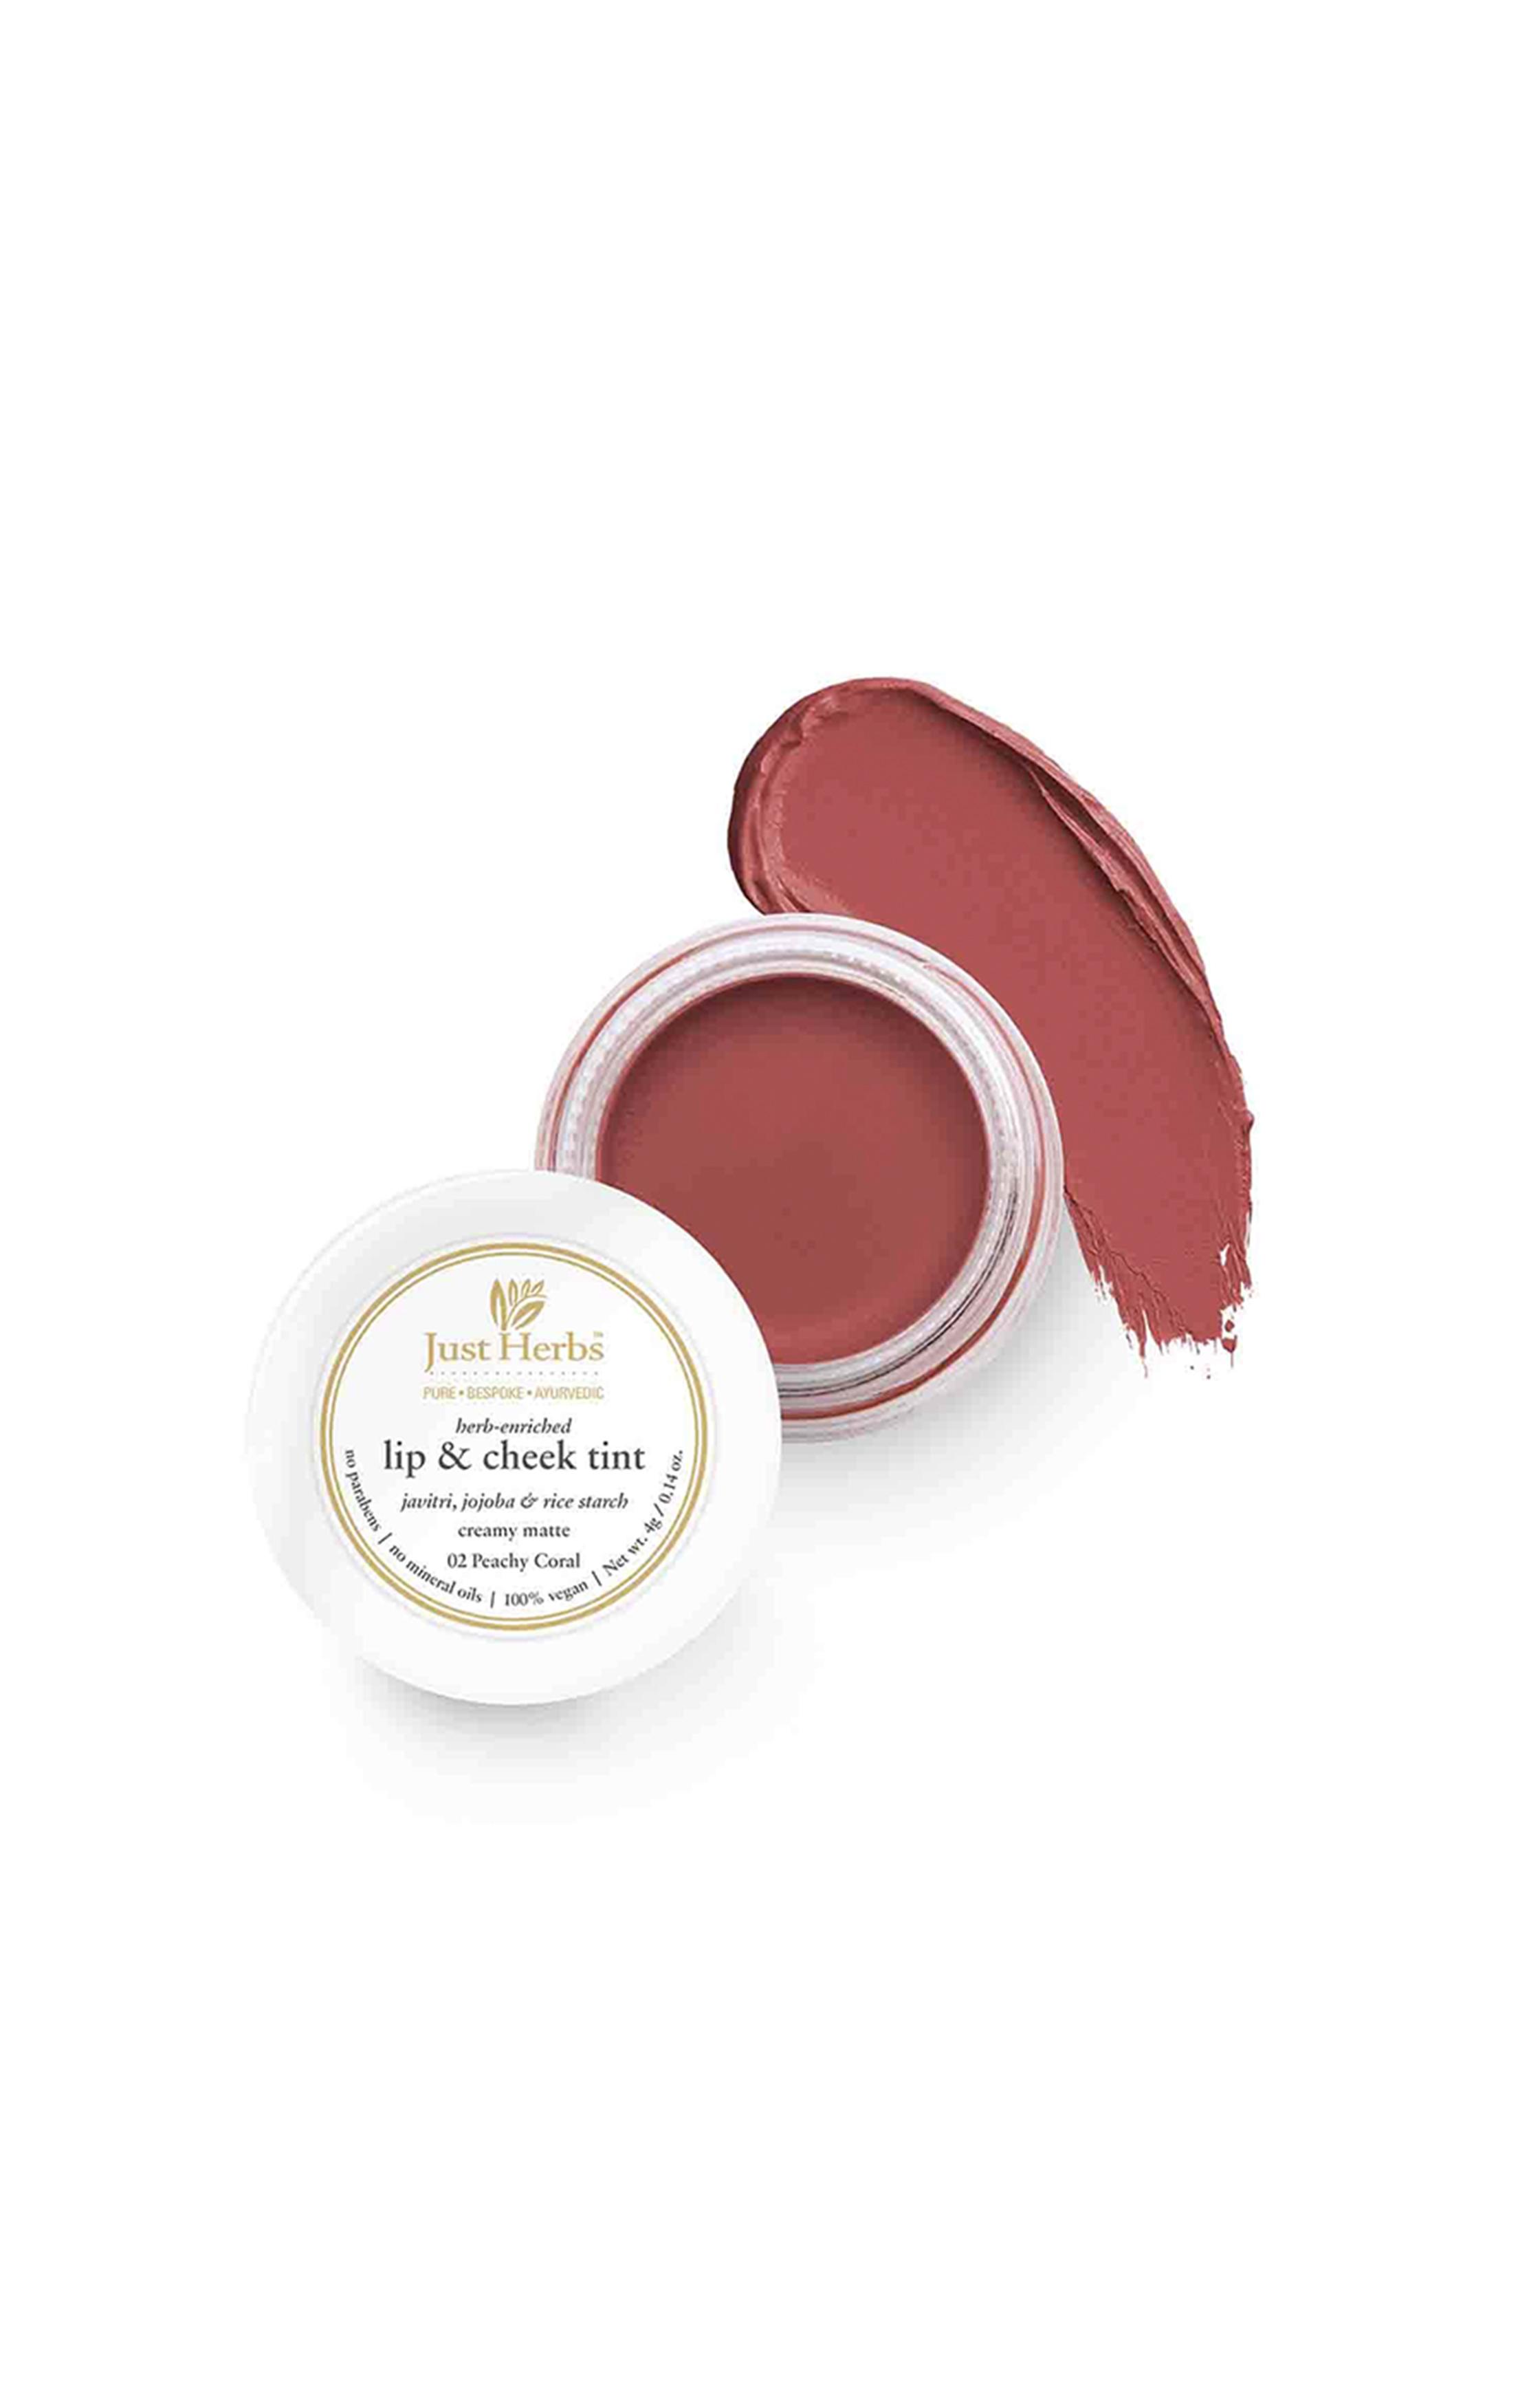 Just Herbs | Just Herbs Lip and Cheek Tint -02 Peachy coral